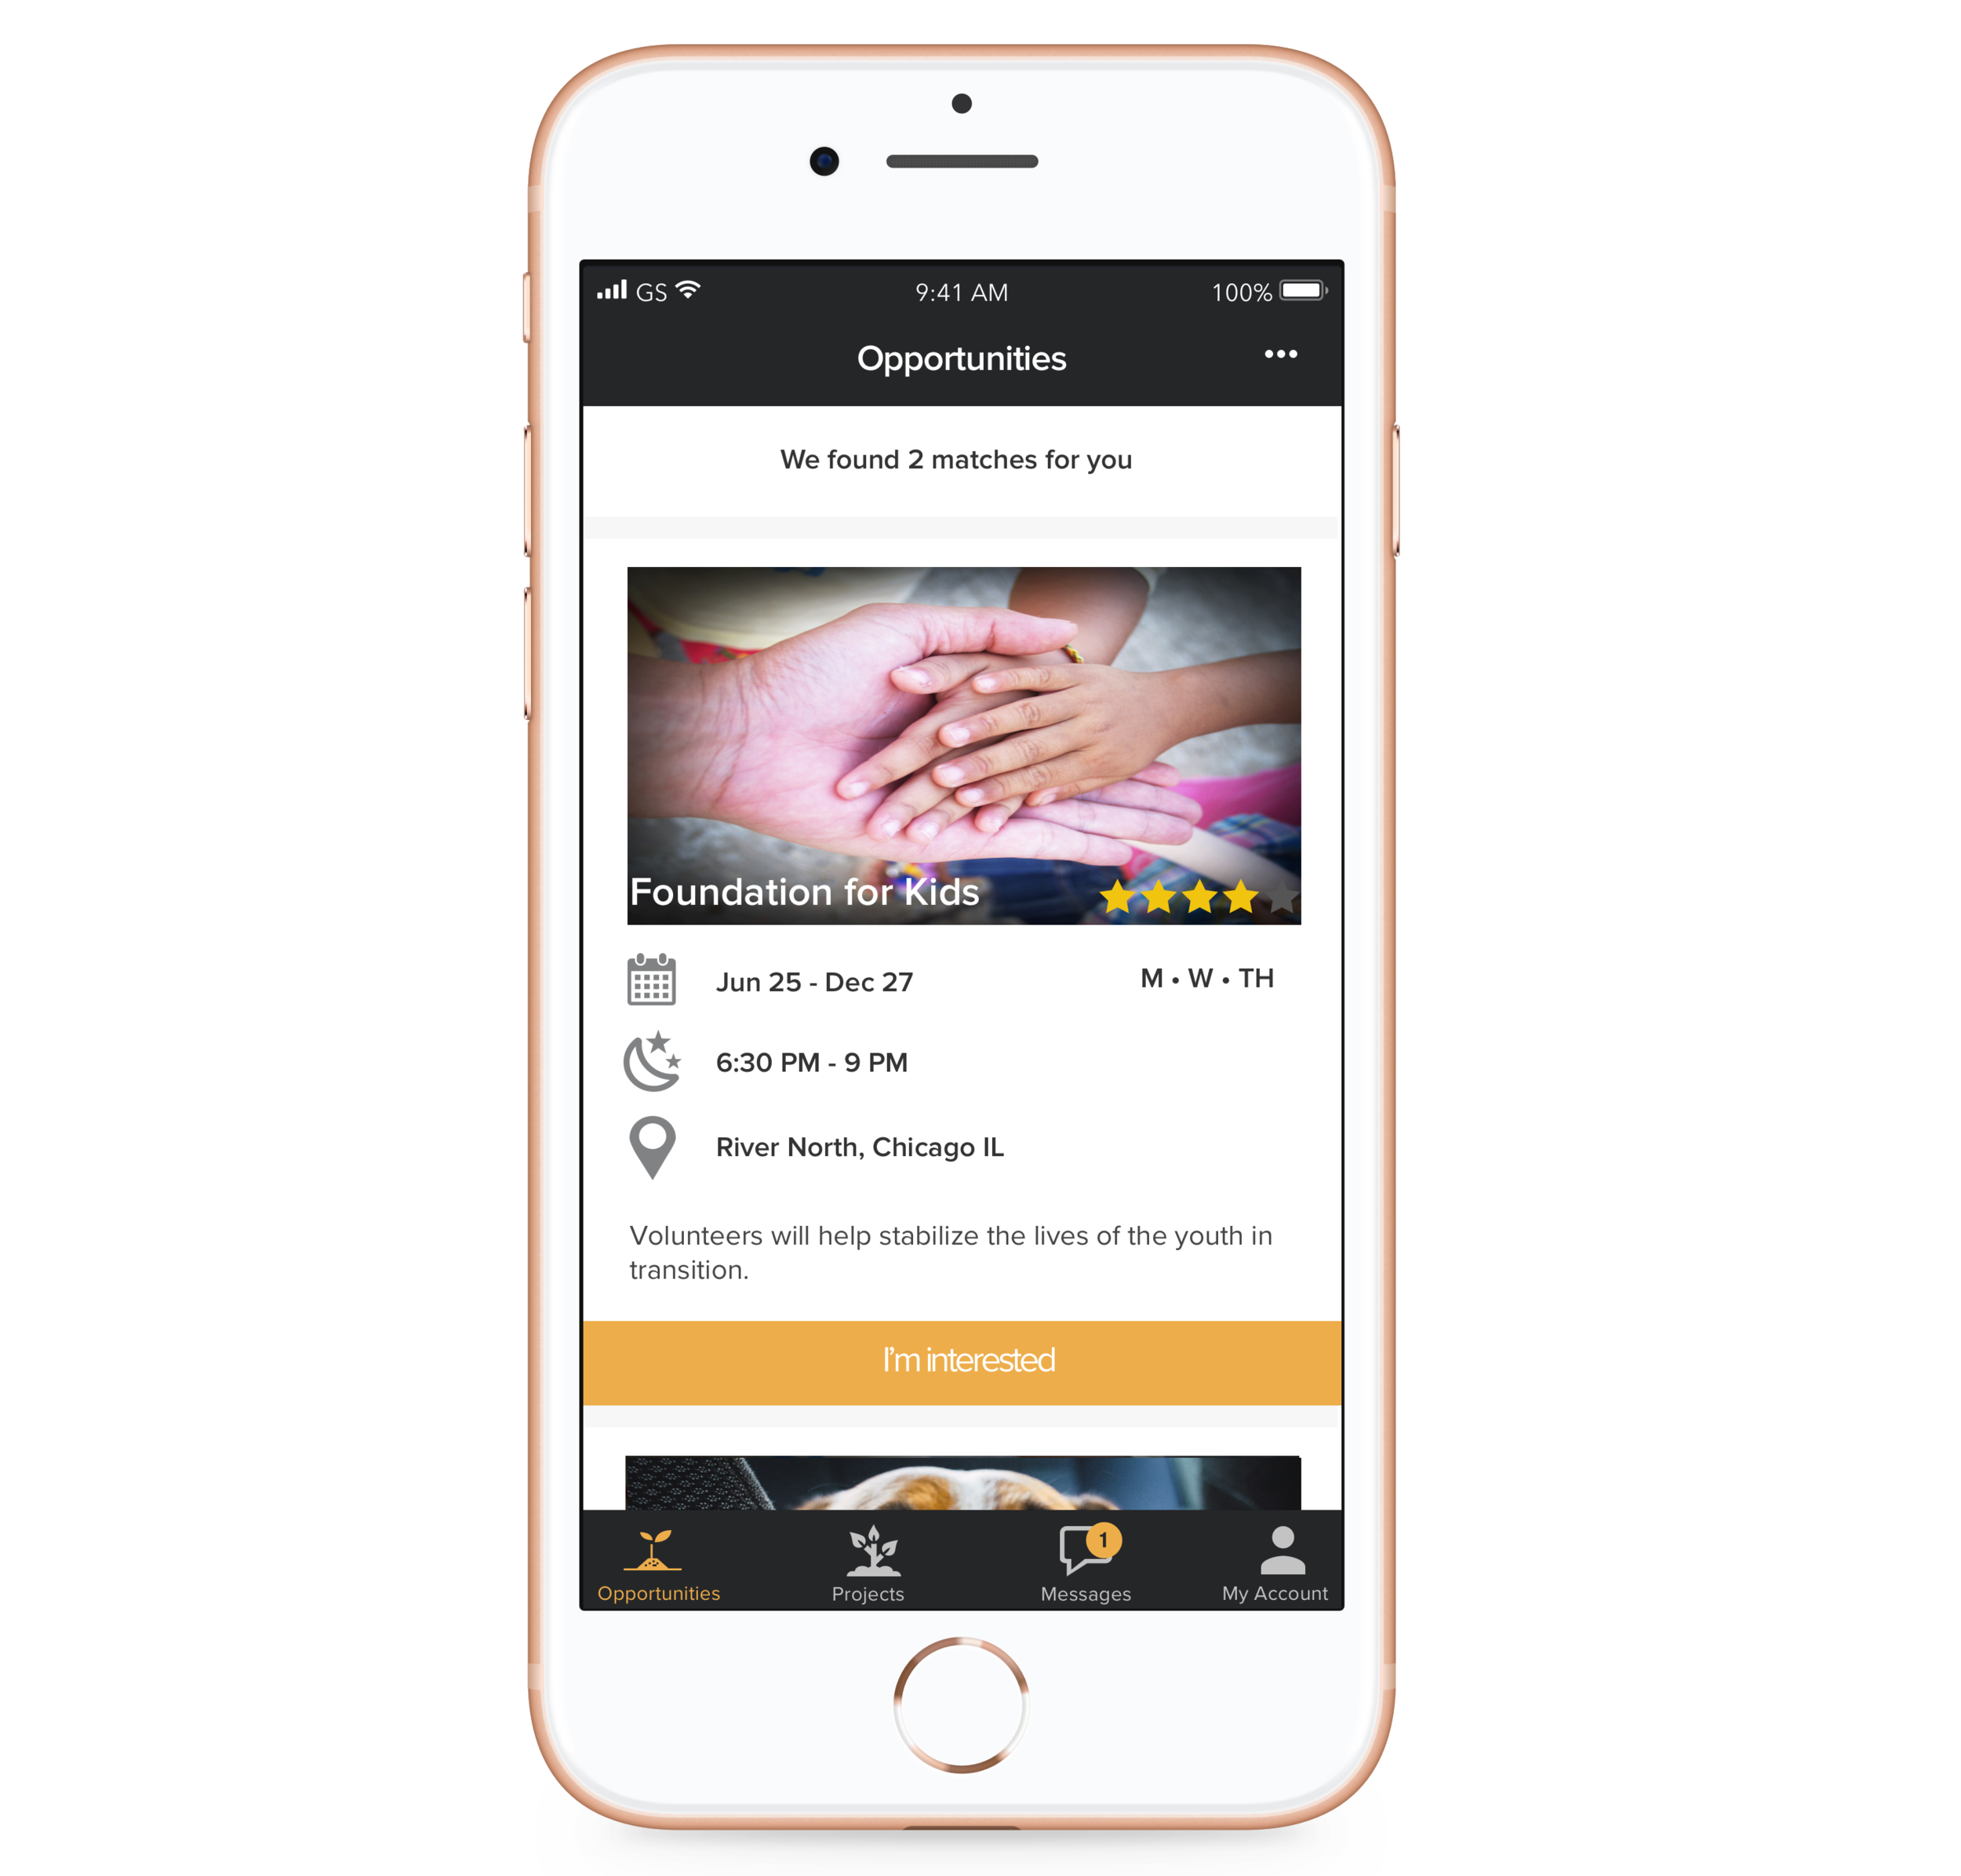 WeWork Cares - Innovating design for the WeWork community